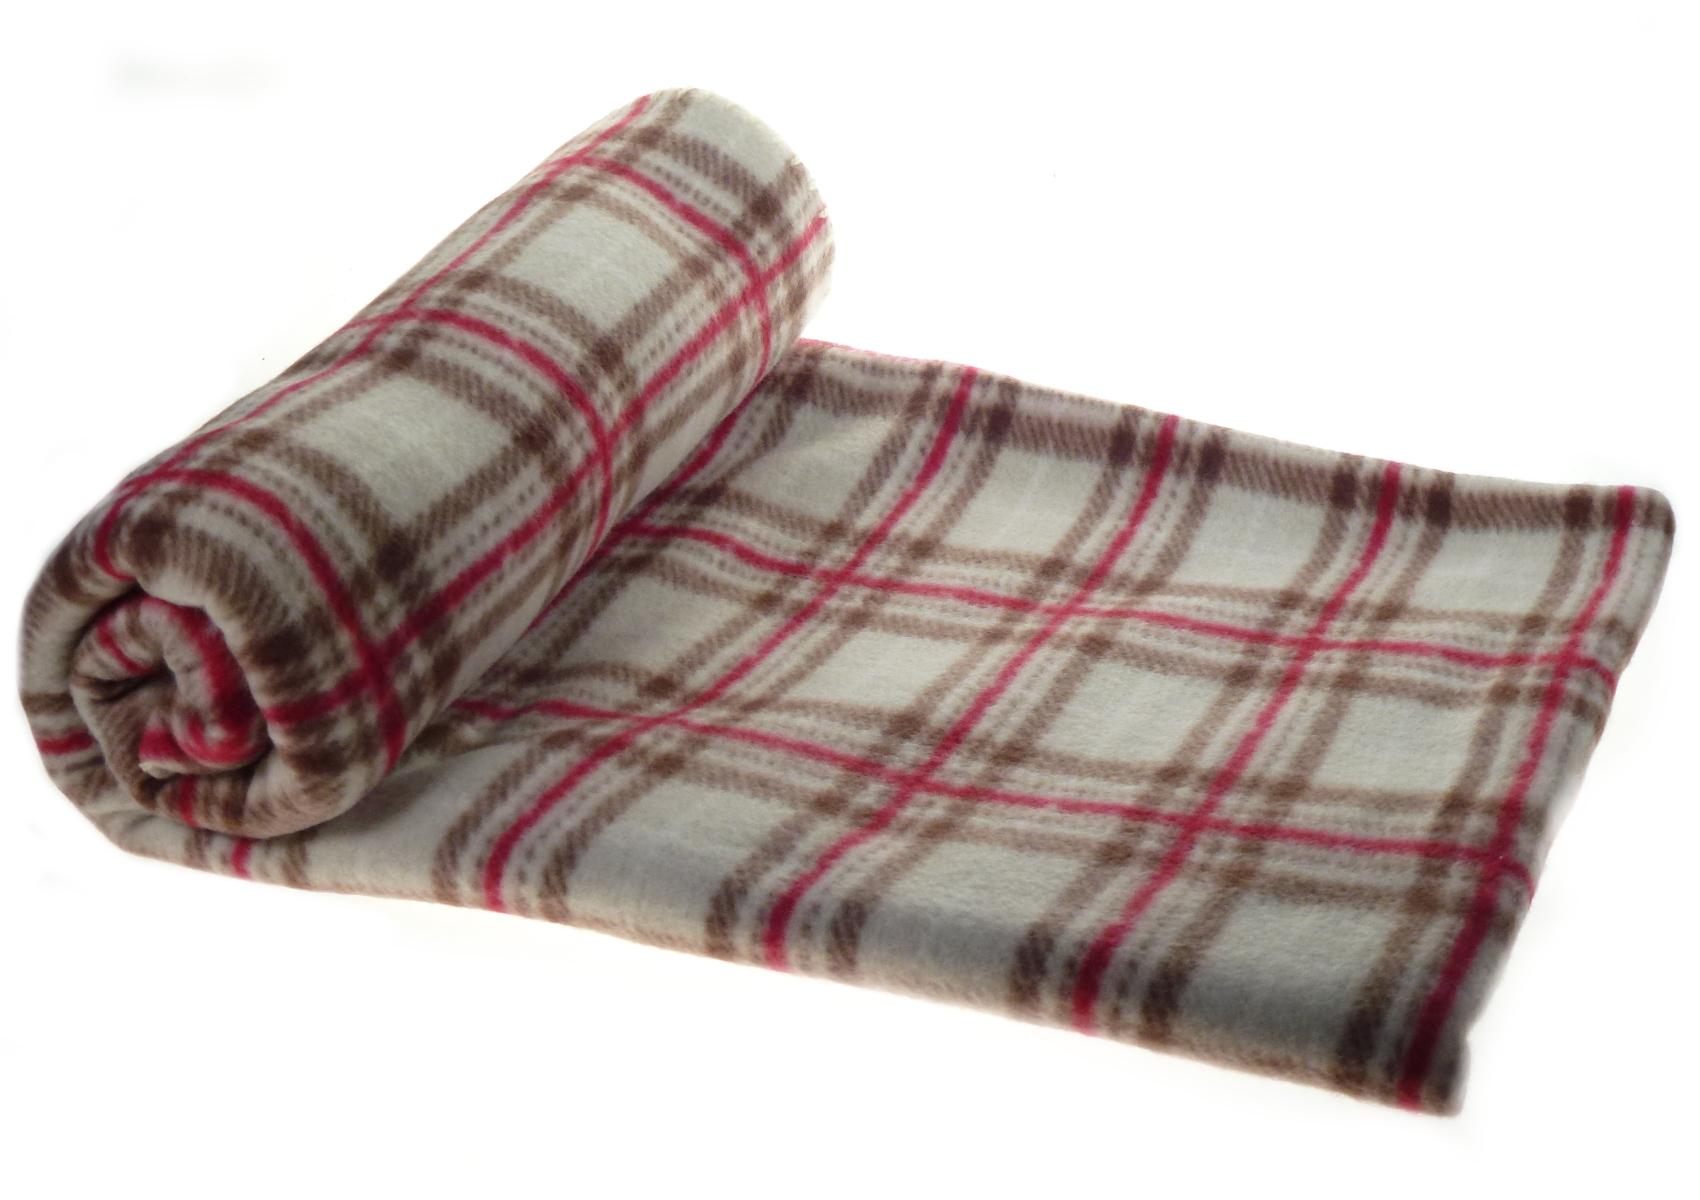 Dog Puppy Checked Lap Blanket Soft Polar Fleece Kitten Bed